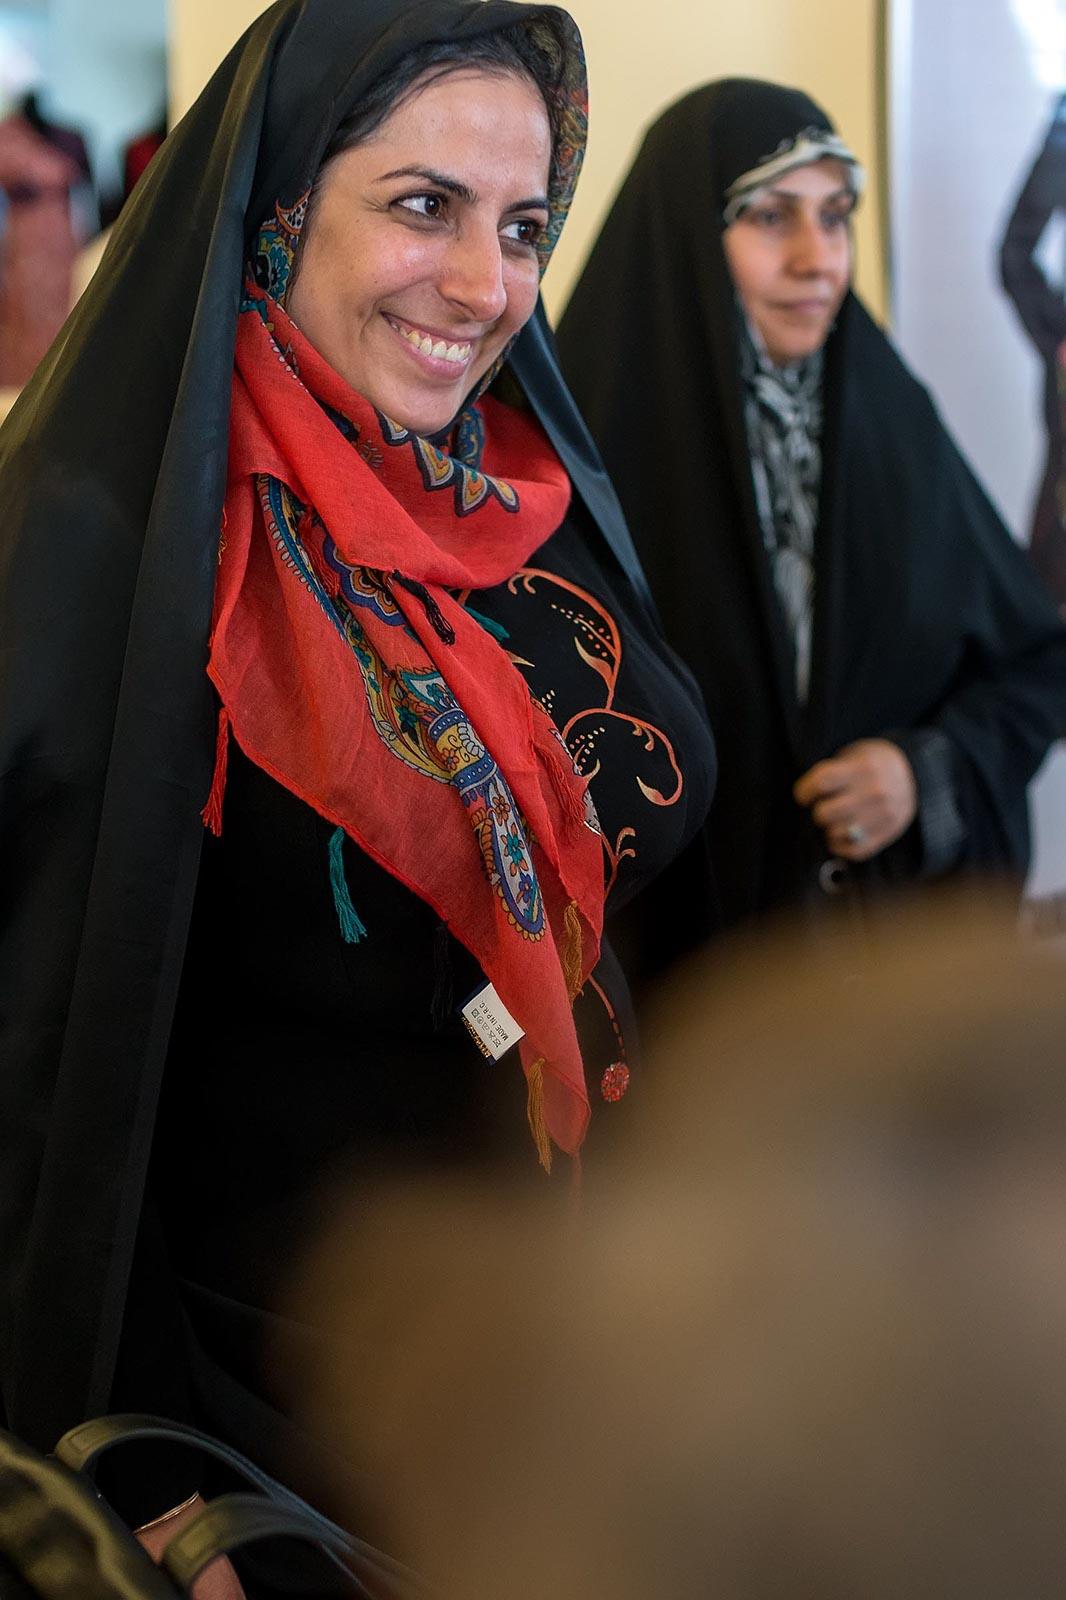 Фото №176422. Фахима Кареми (?), Саине Бешарат (дизайнеры одежды)